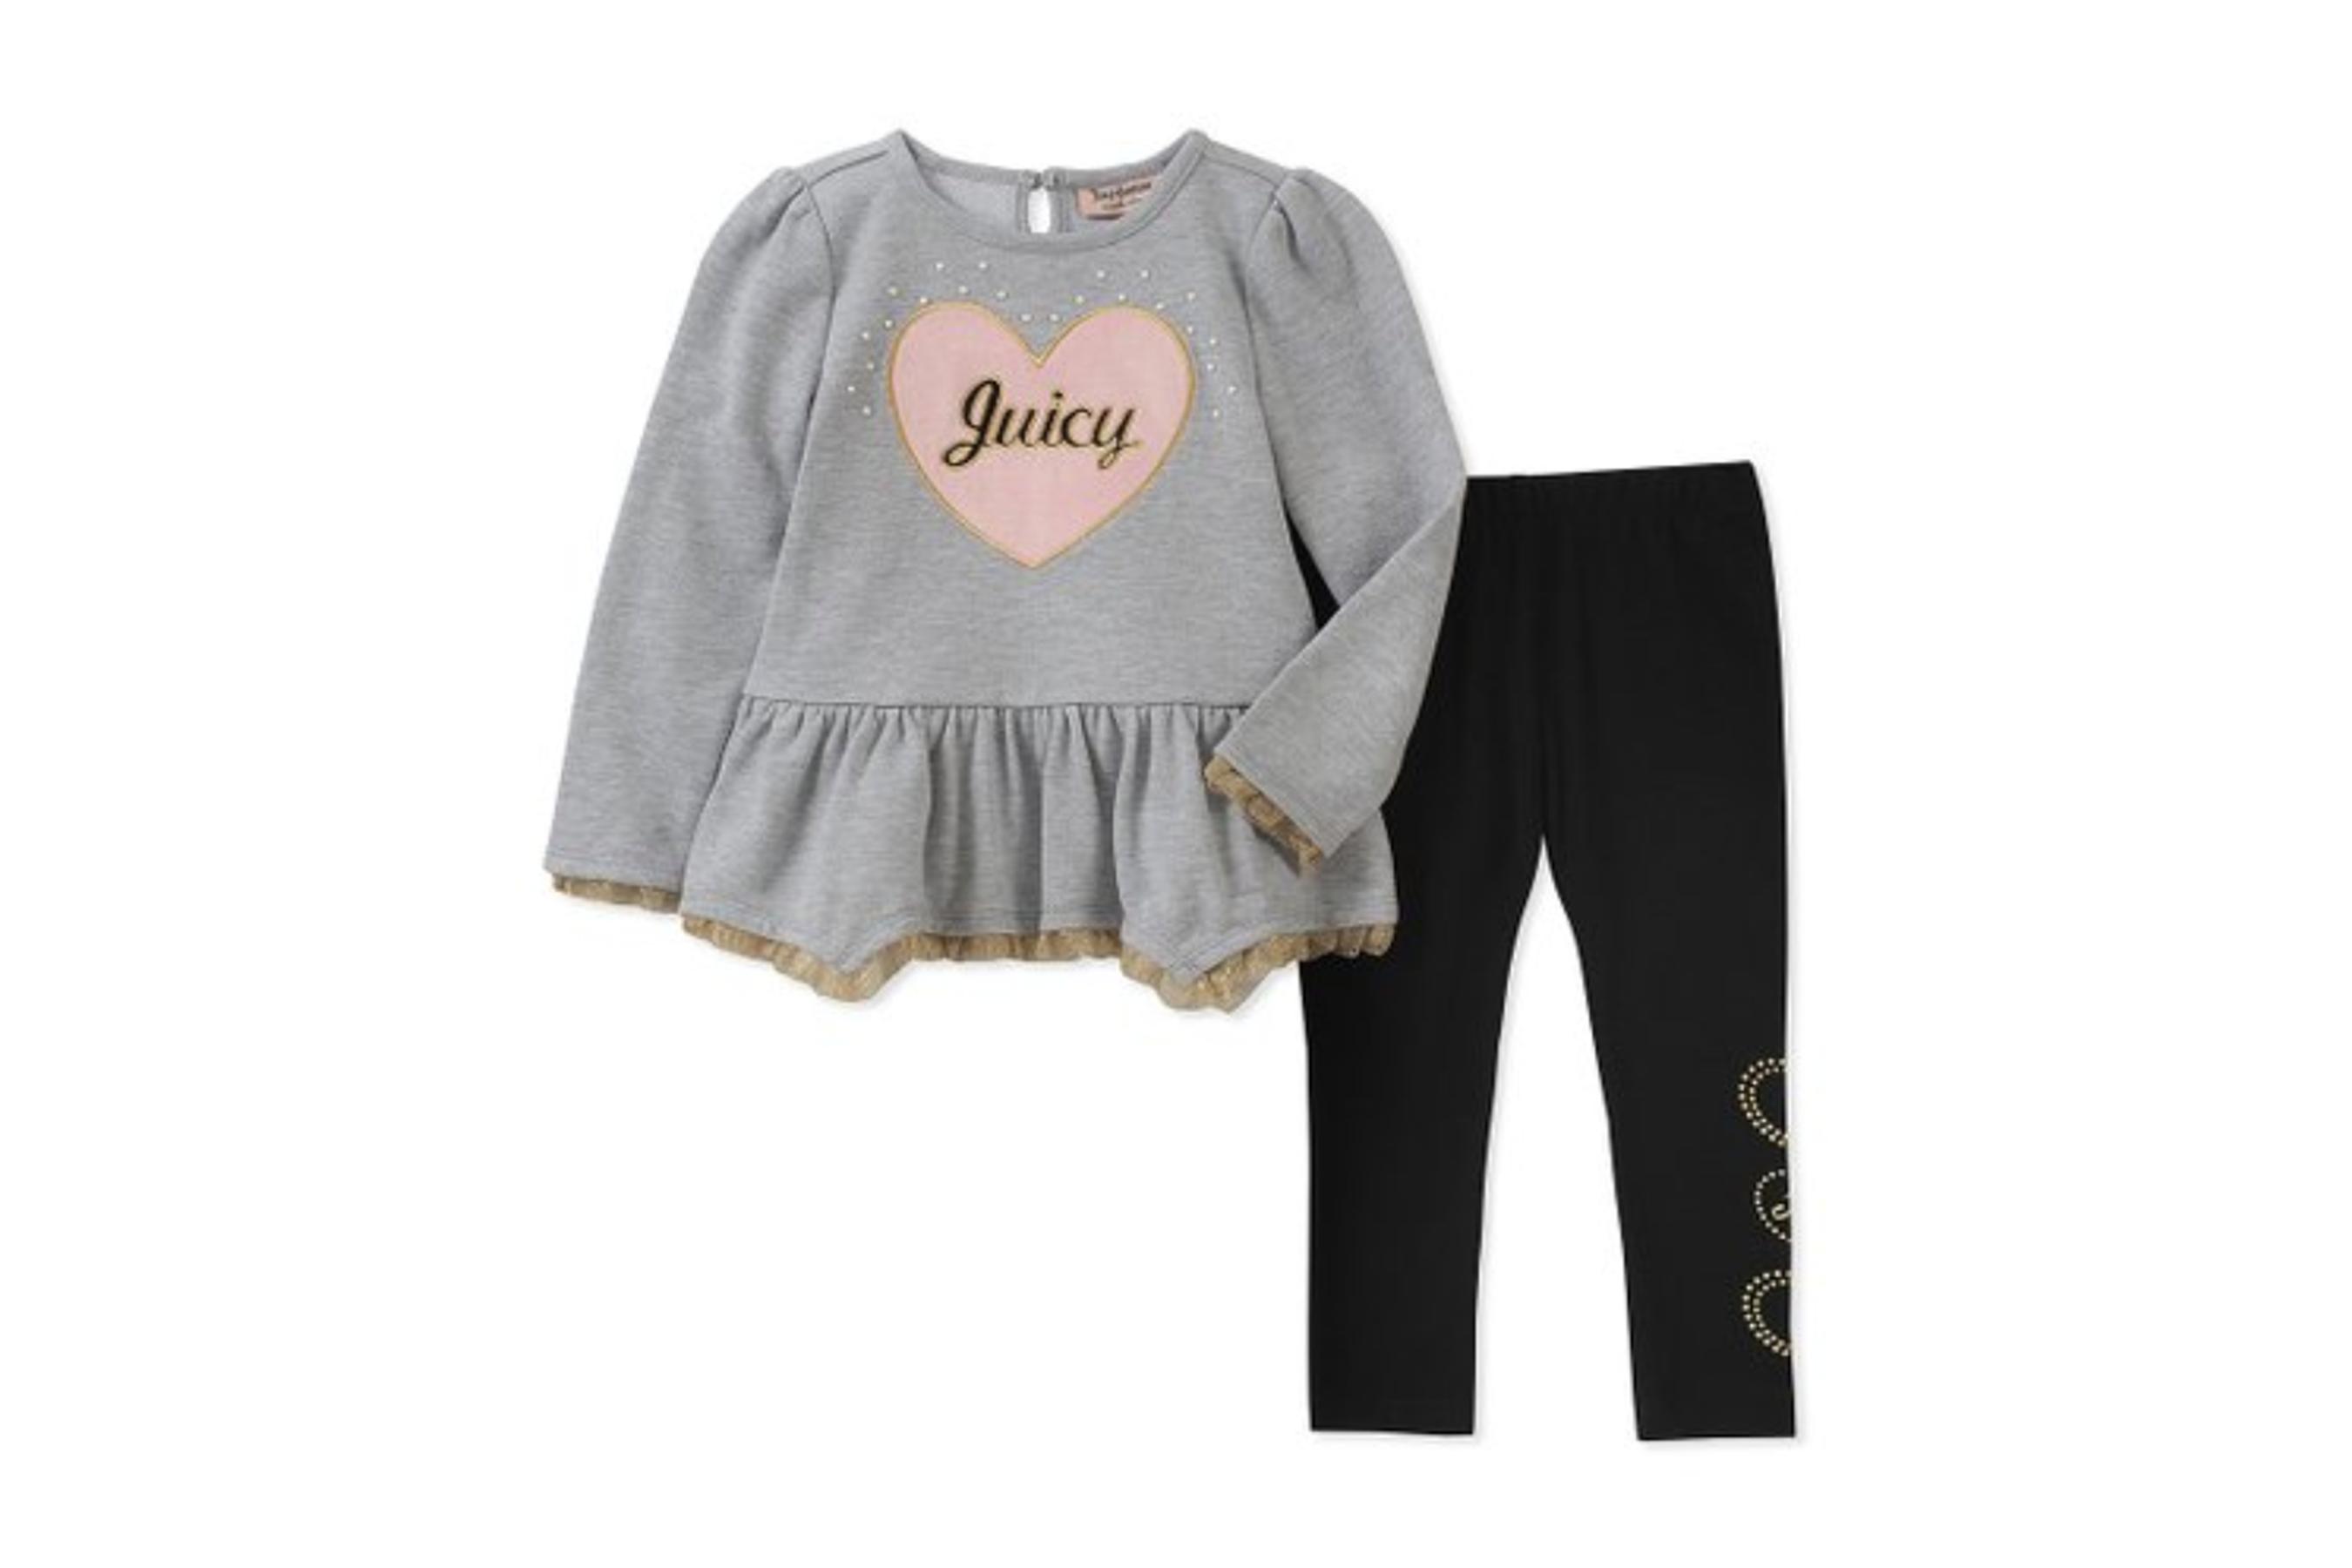 96f3beb24 Brand Name Kids Clothes $9.99 - $23.99 Juicy, Calvin, Nautica ...